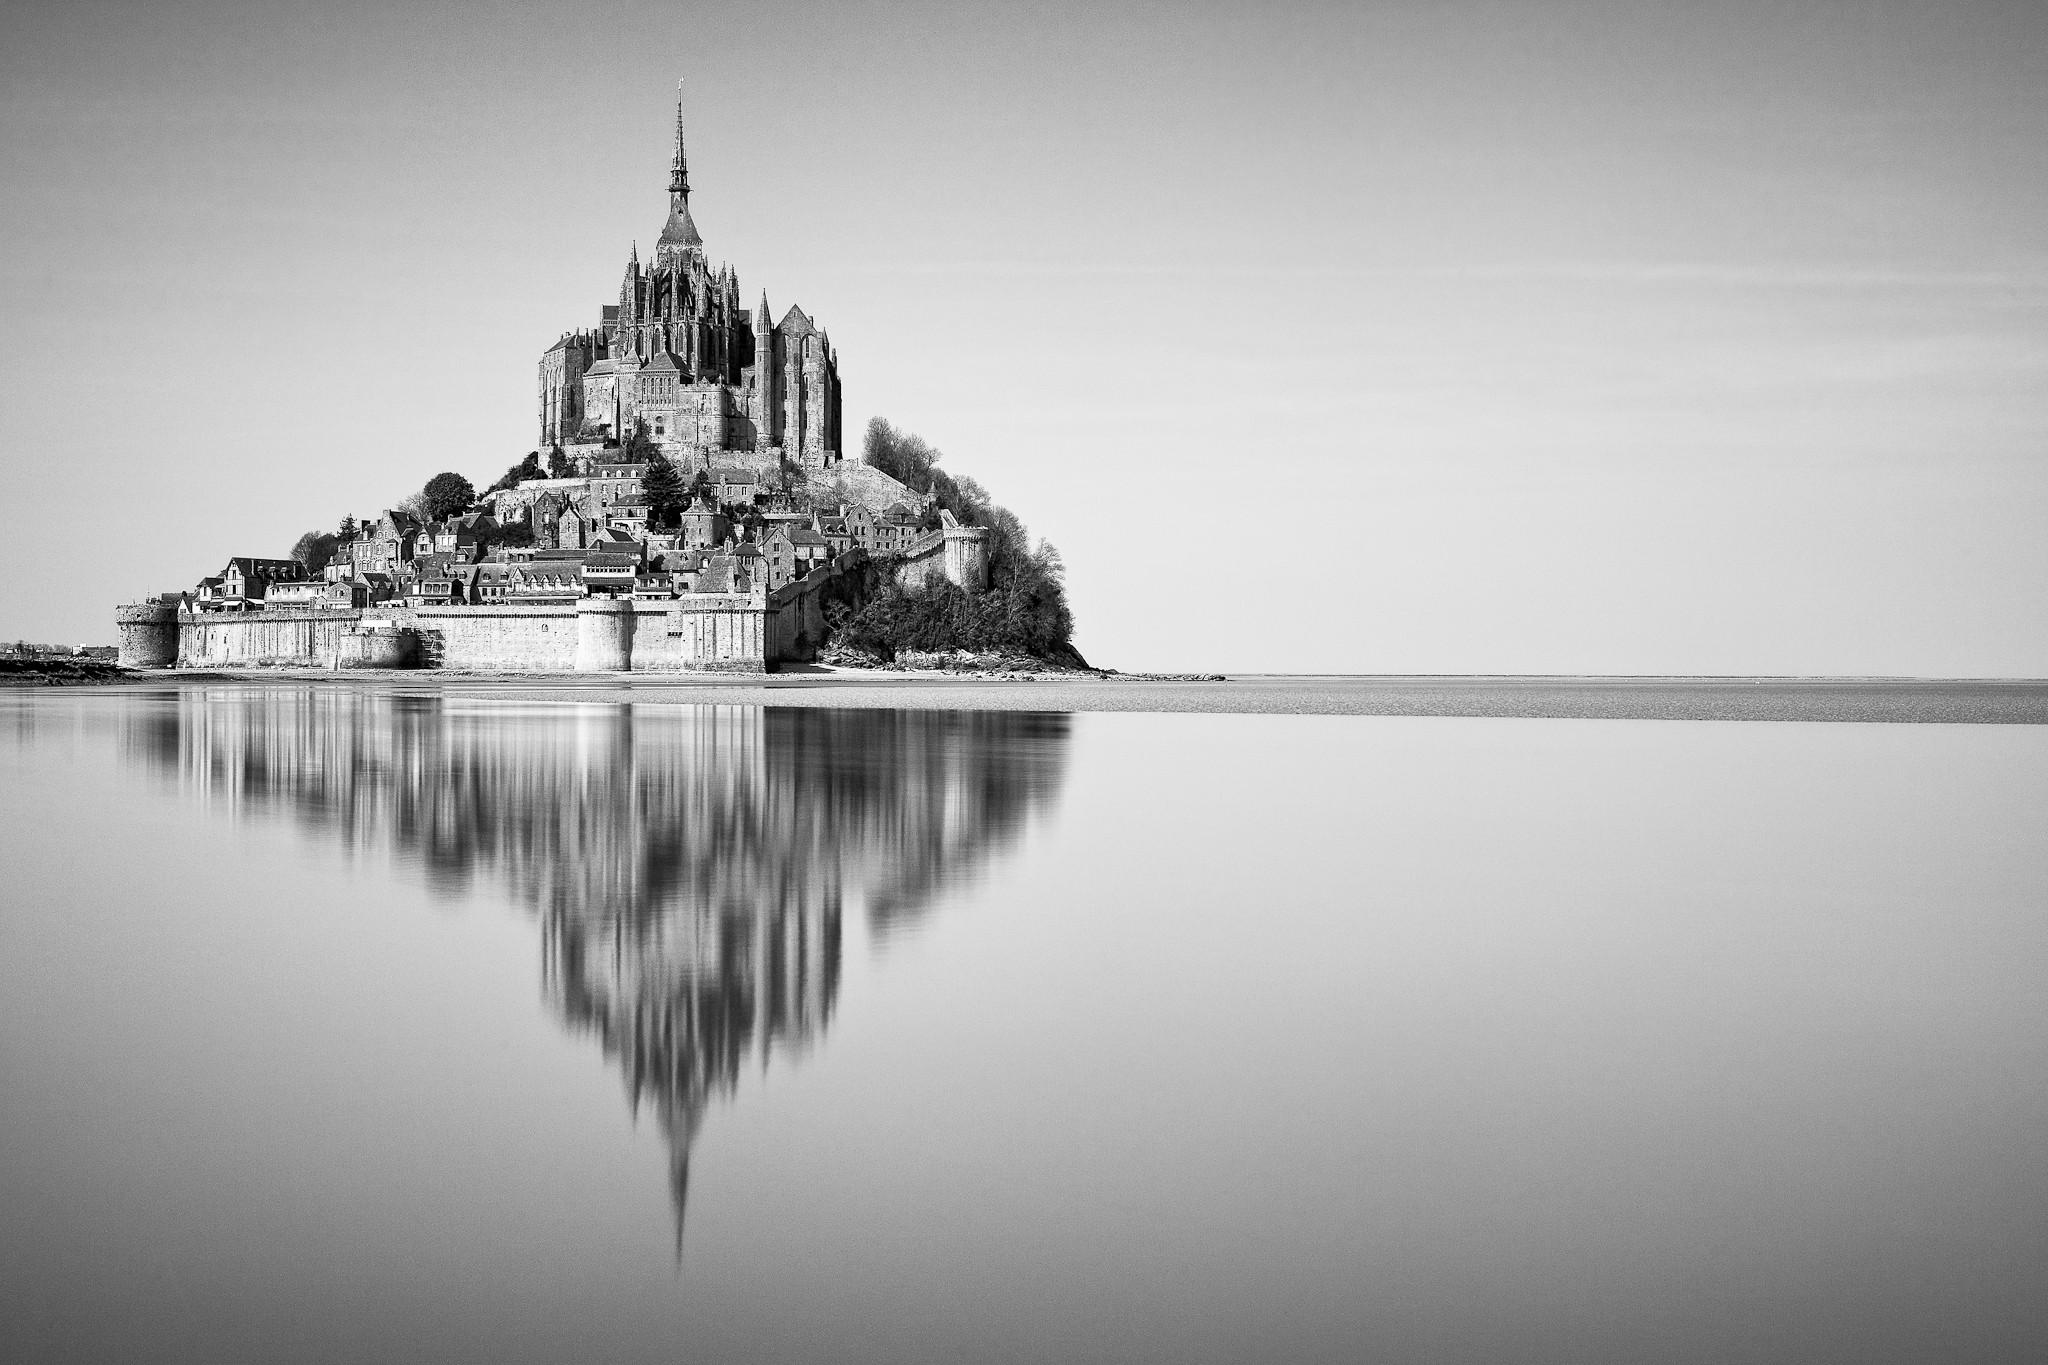 General 2048x1365 Mont Saint-Michel France monochrome Abbey island fort